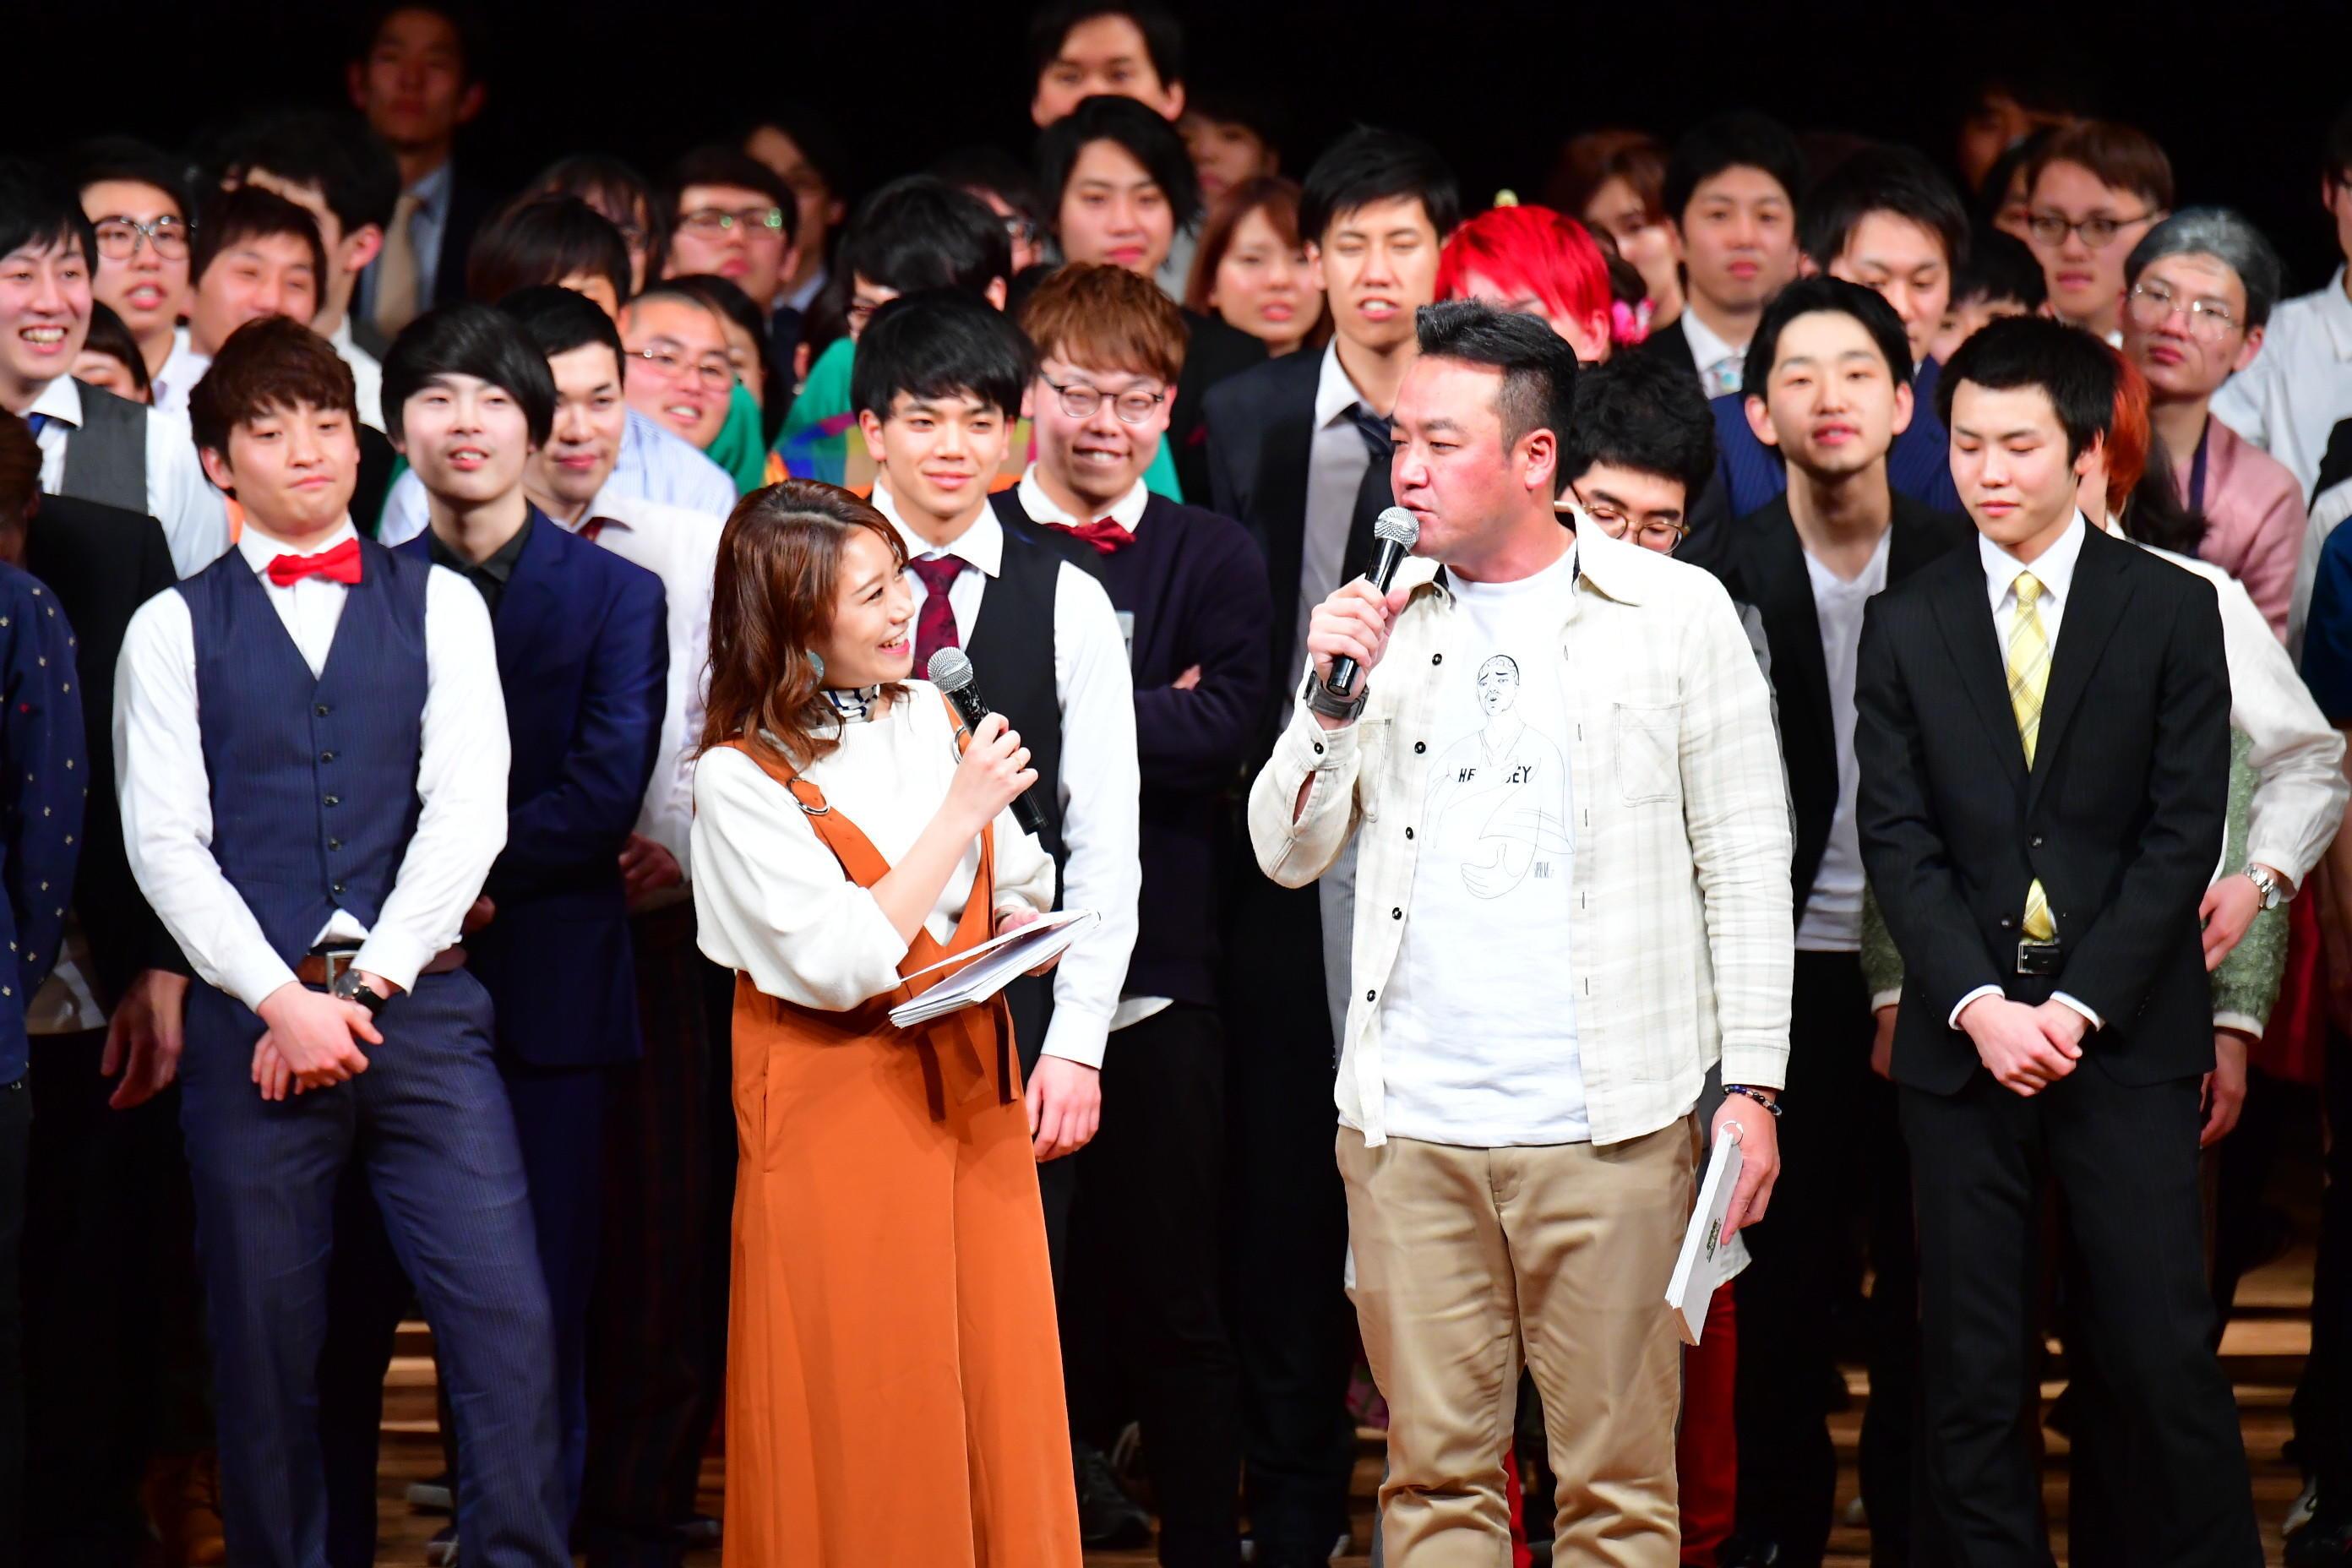 http://news.yoshimoto.co.jp/20180228001224-4ce1f35828784e9a19e7bfce8d9e0bac2e733c96.jpg